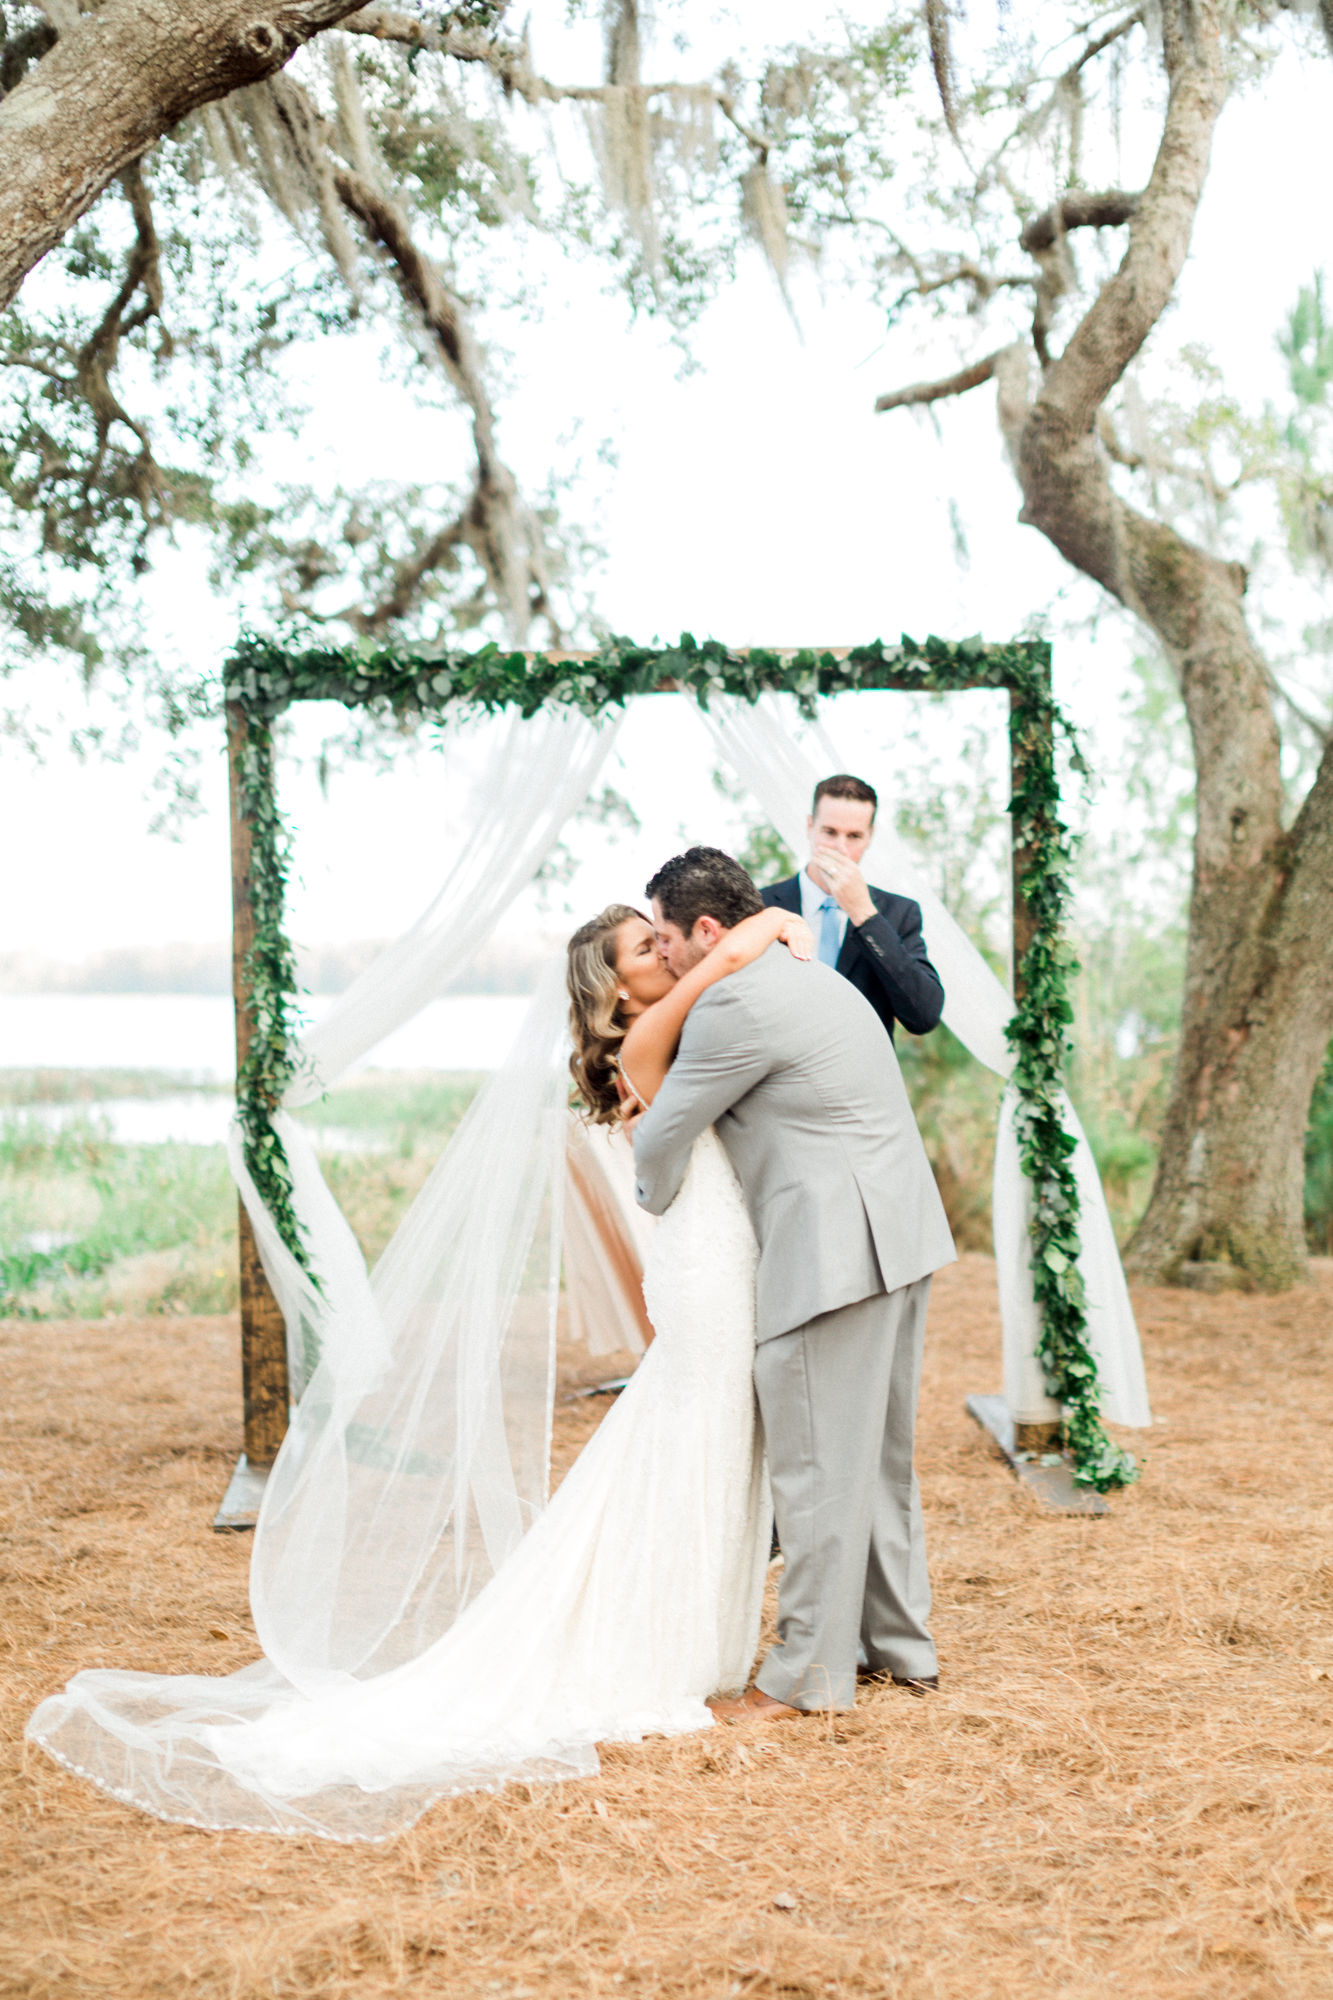 jessica-bellinger-photography-harmony-golf-preserve-wedding-photos-9160.jpg